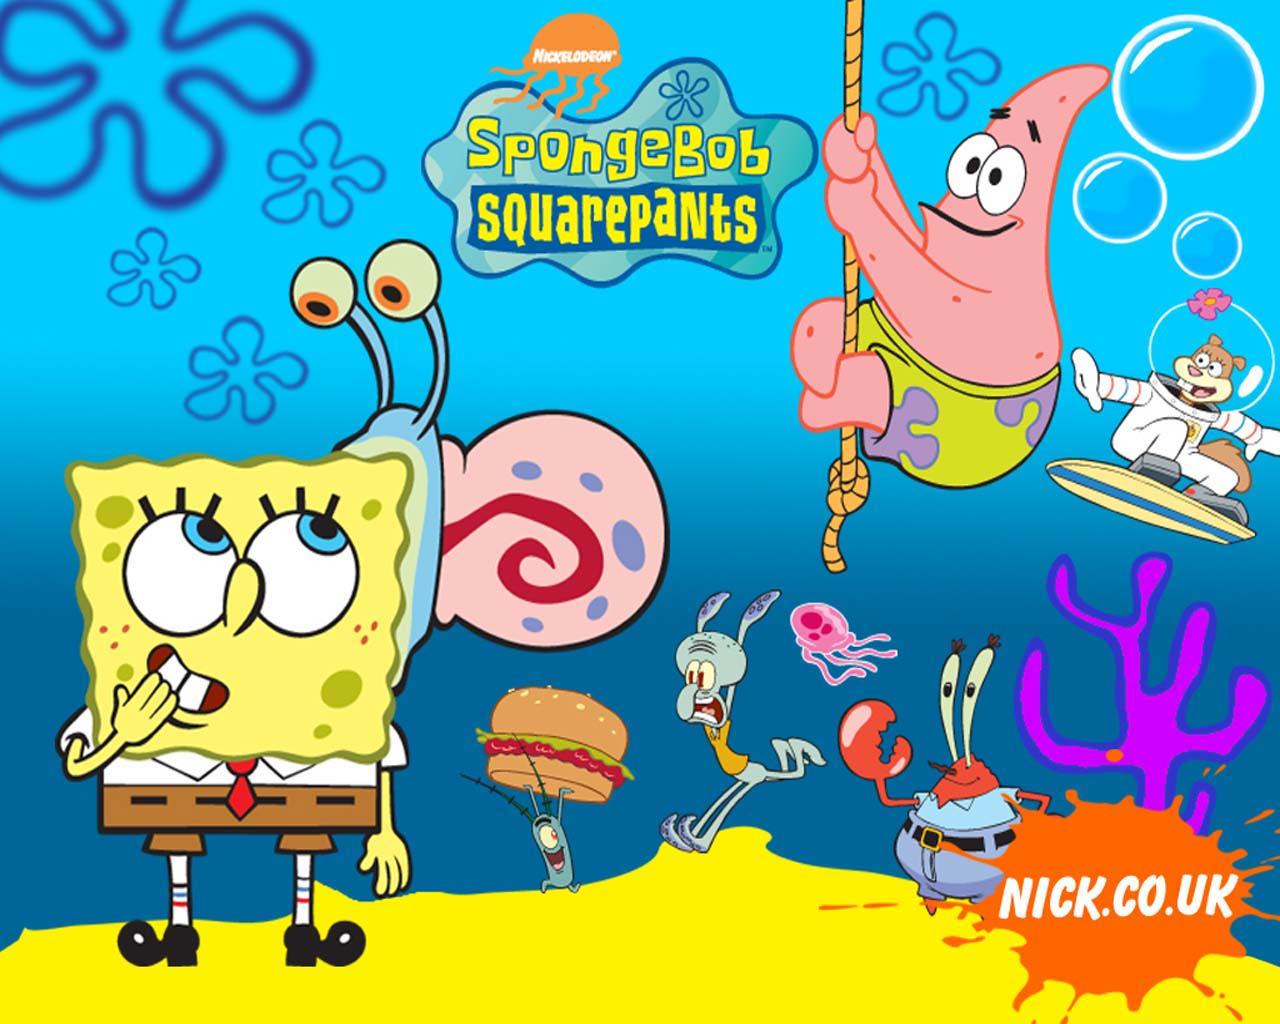 http://4.bp.blogspot.com/-IhkBnBqUAUw/TbZmiWQ-vGI/AAAAAAAAAVA/KckErehkcgk/s1600/spongebob-wallpaper-042.jpg